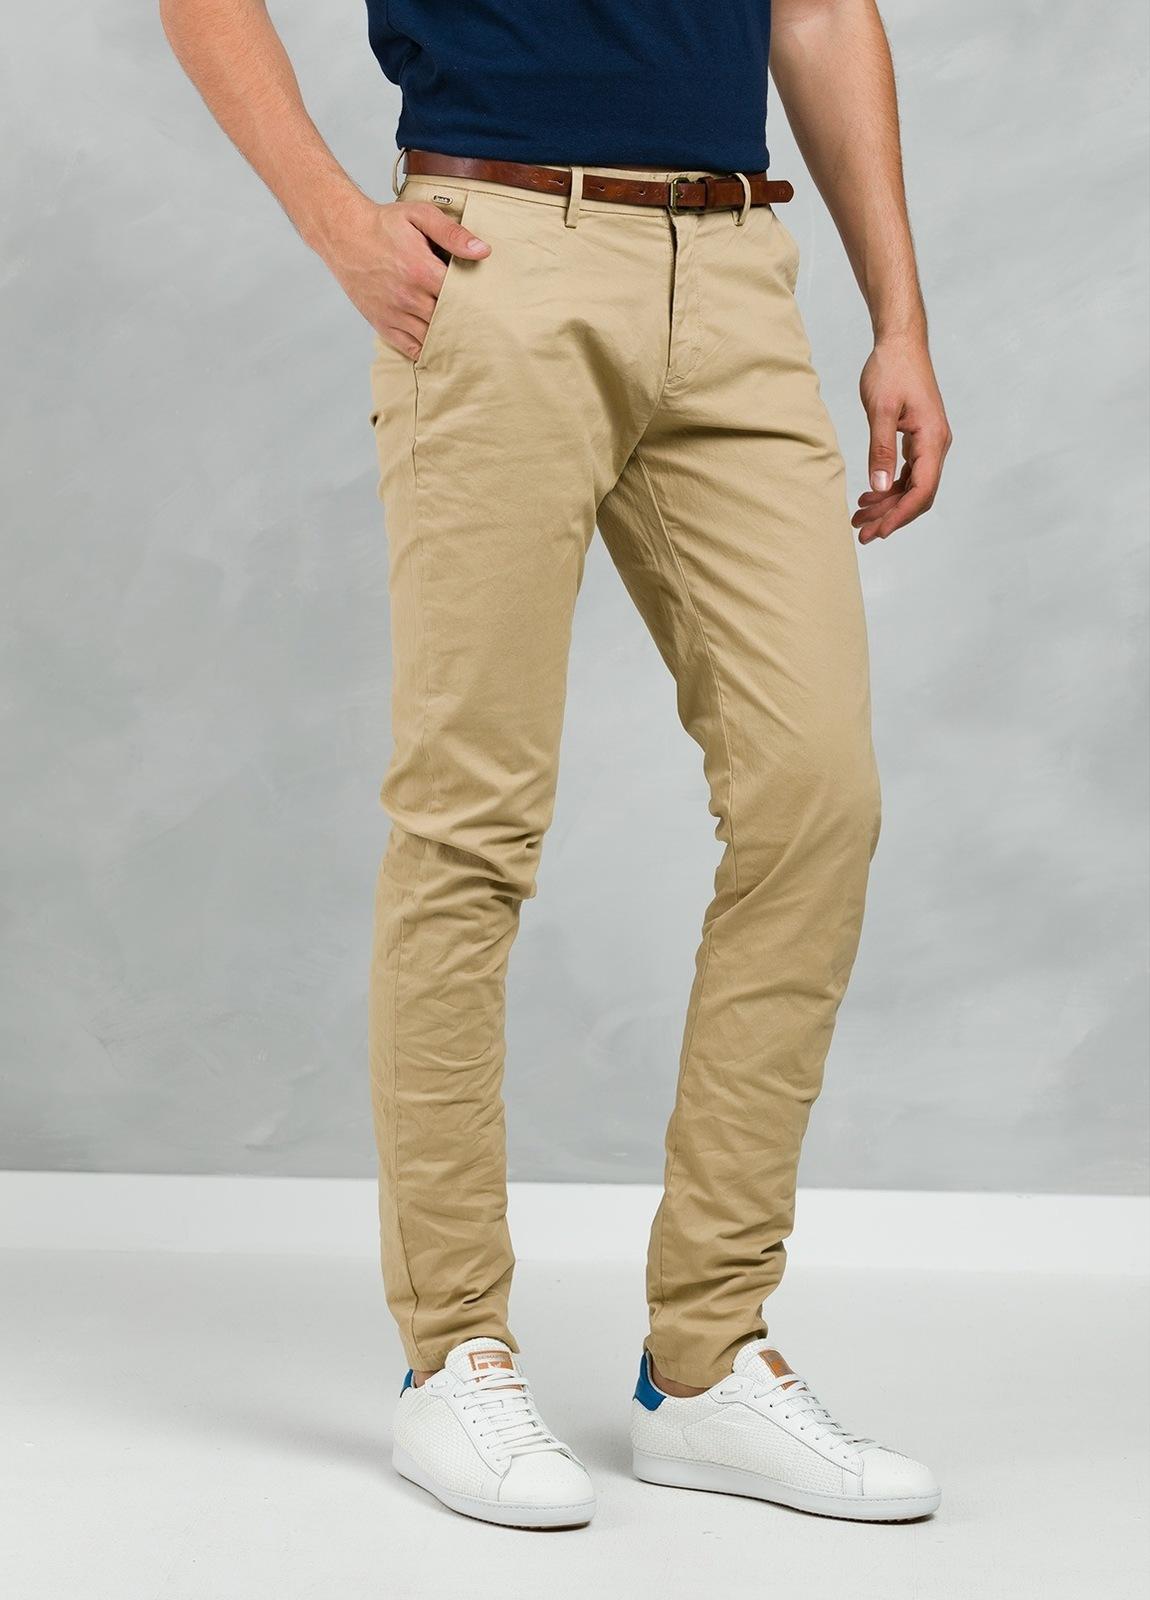 Pantalón chino color tostado, Algodón. - Ítem2